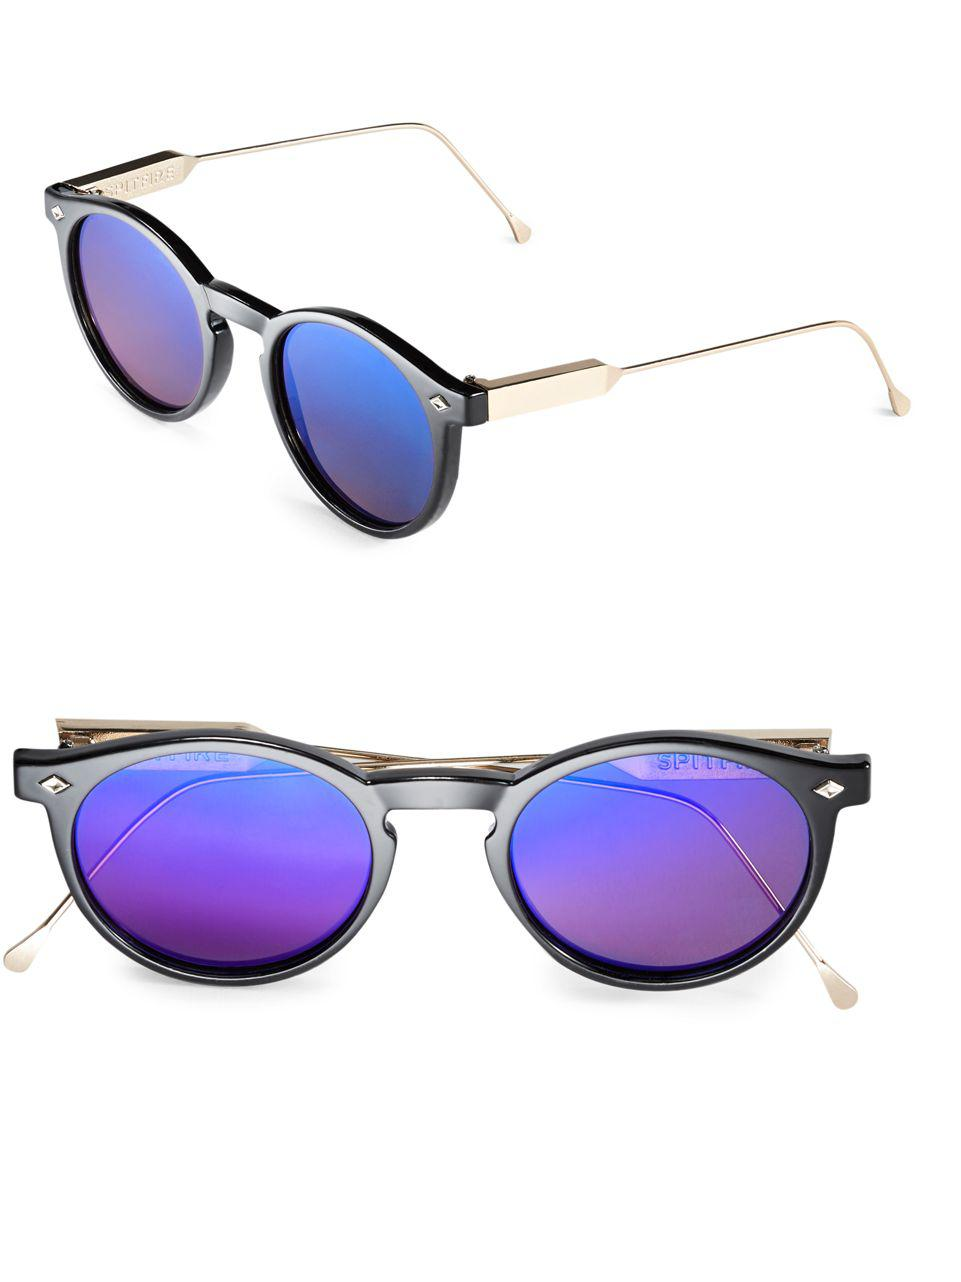 3f46769164 Lyst - Spitfire 54mm Flex Round Sunglasses in Blue